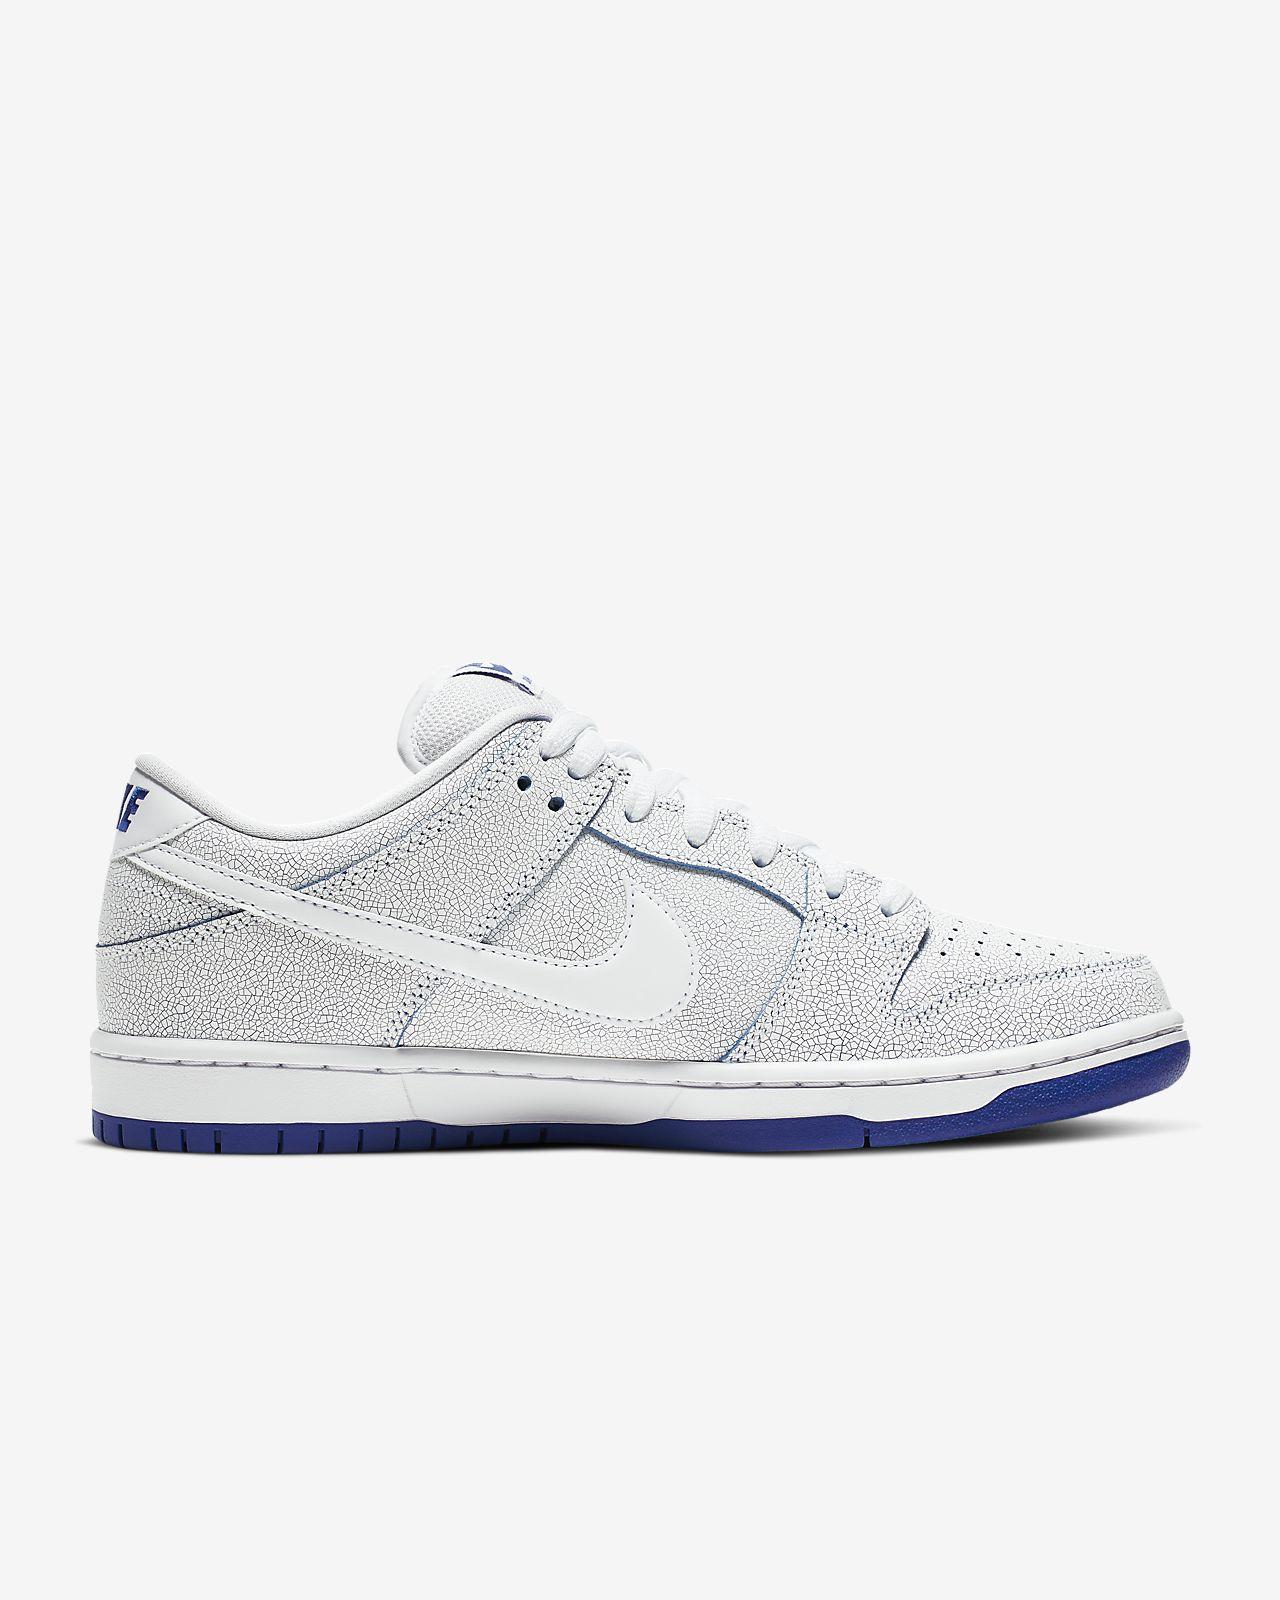 Nike SB Dunk Low Pro Premium Skateschoen